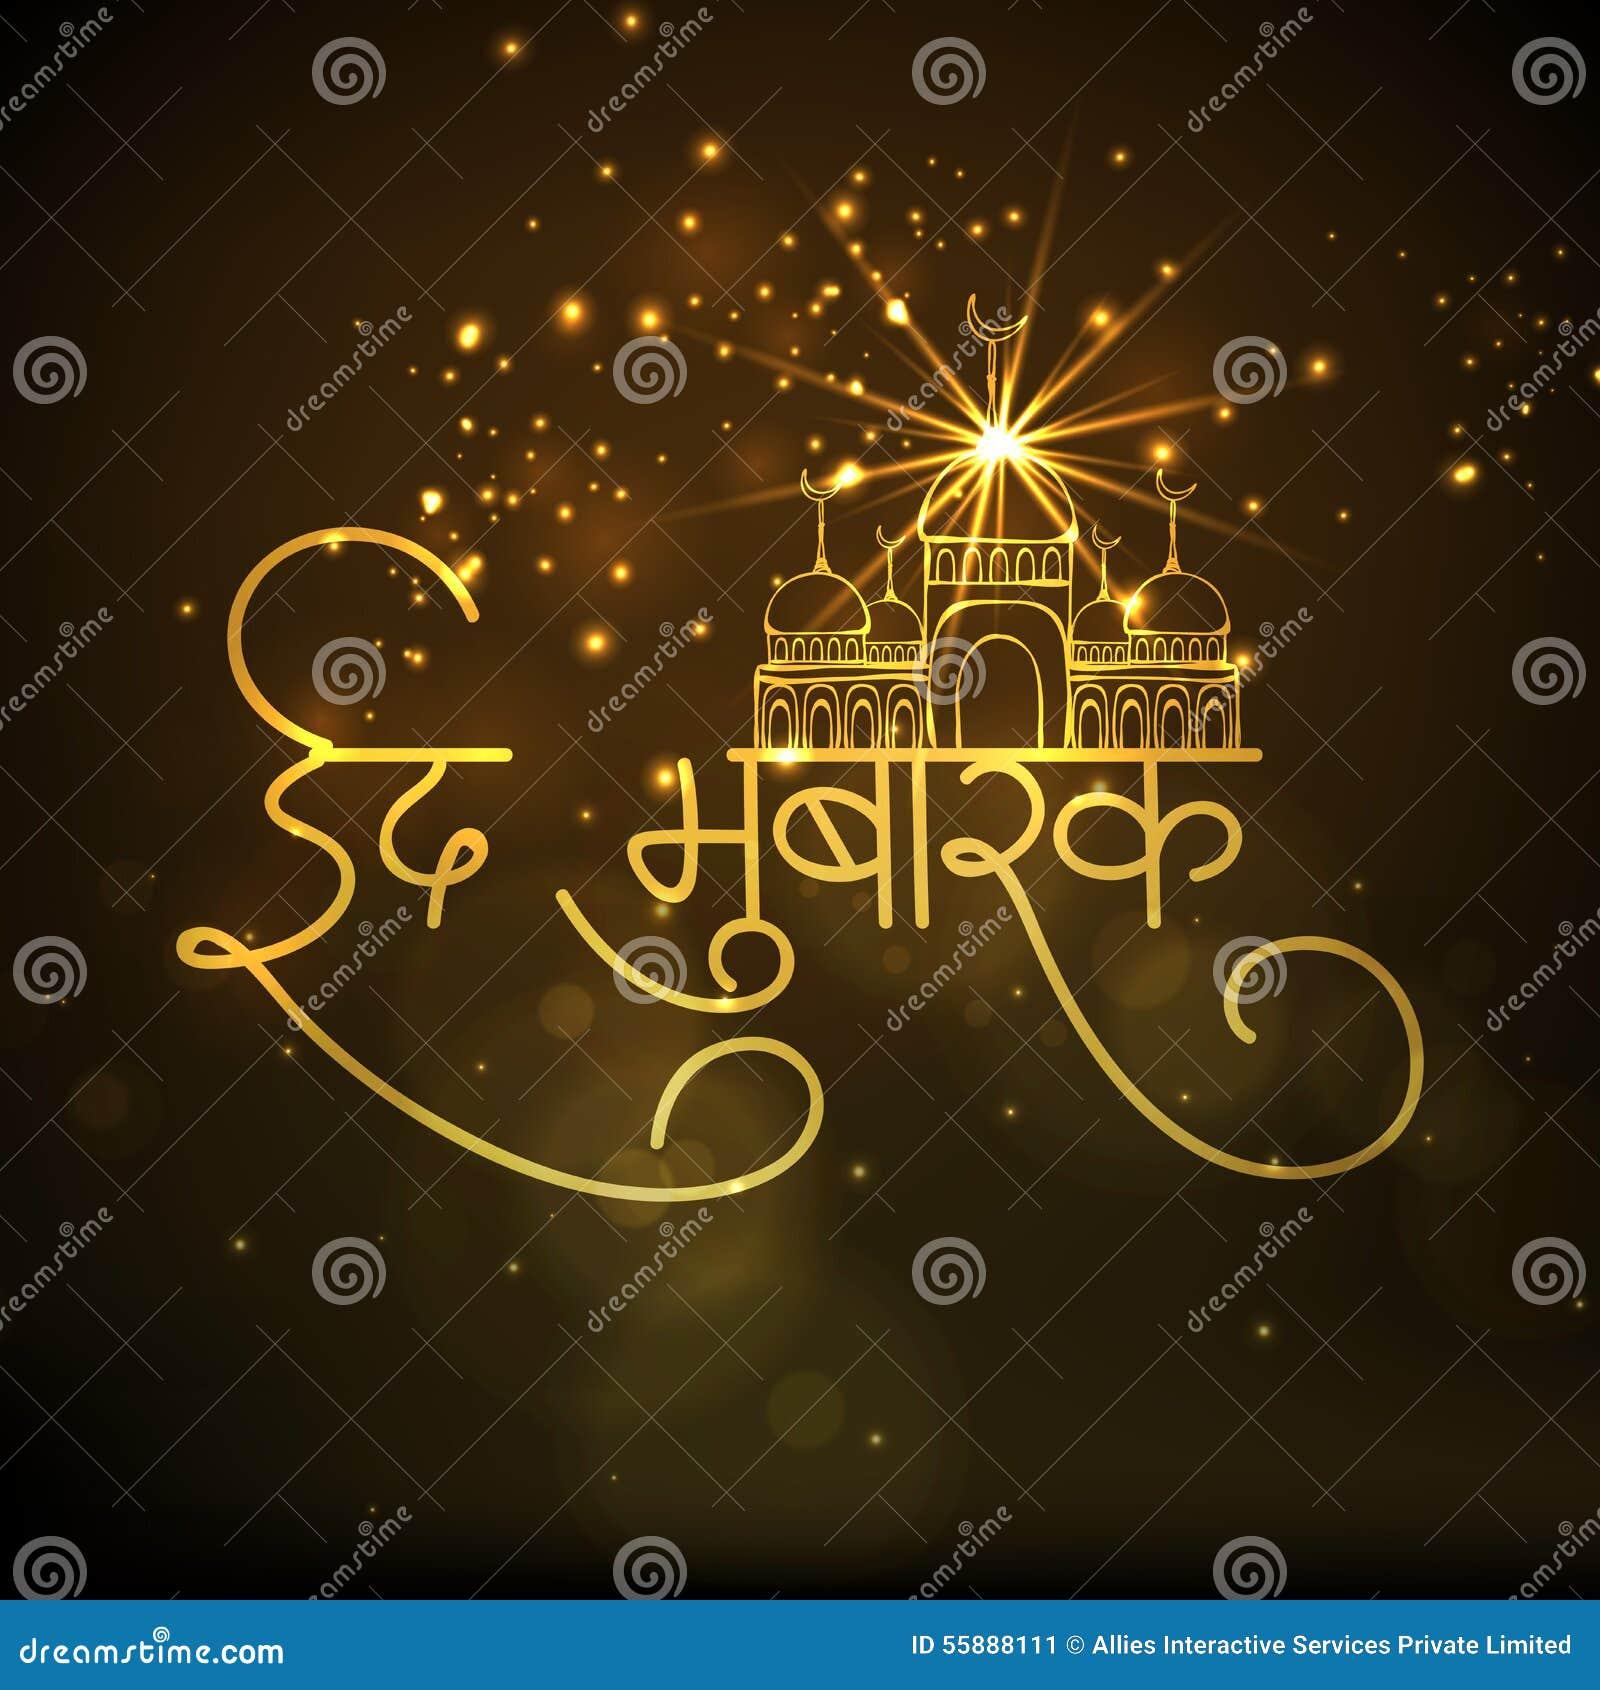 Eid Mubarak Images Hd Hindi Images Hd Download